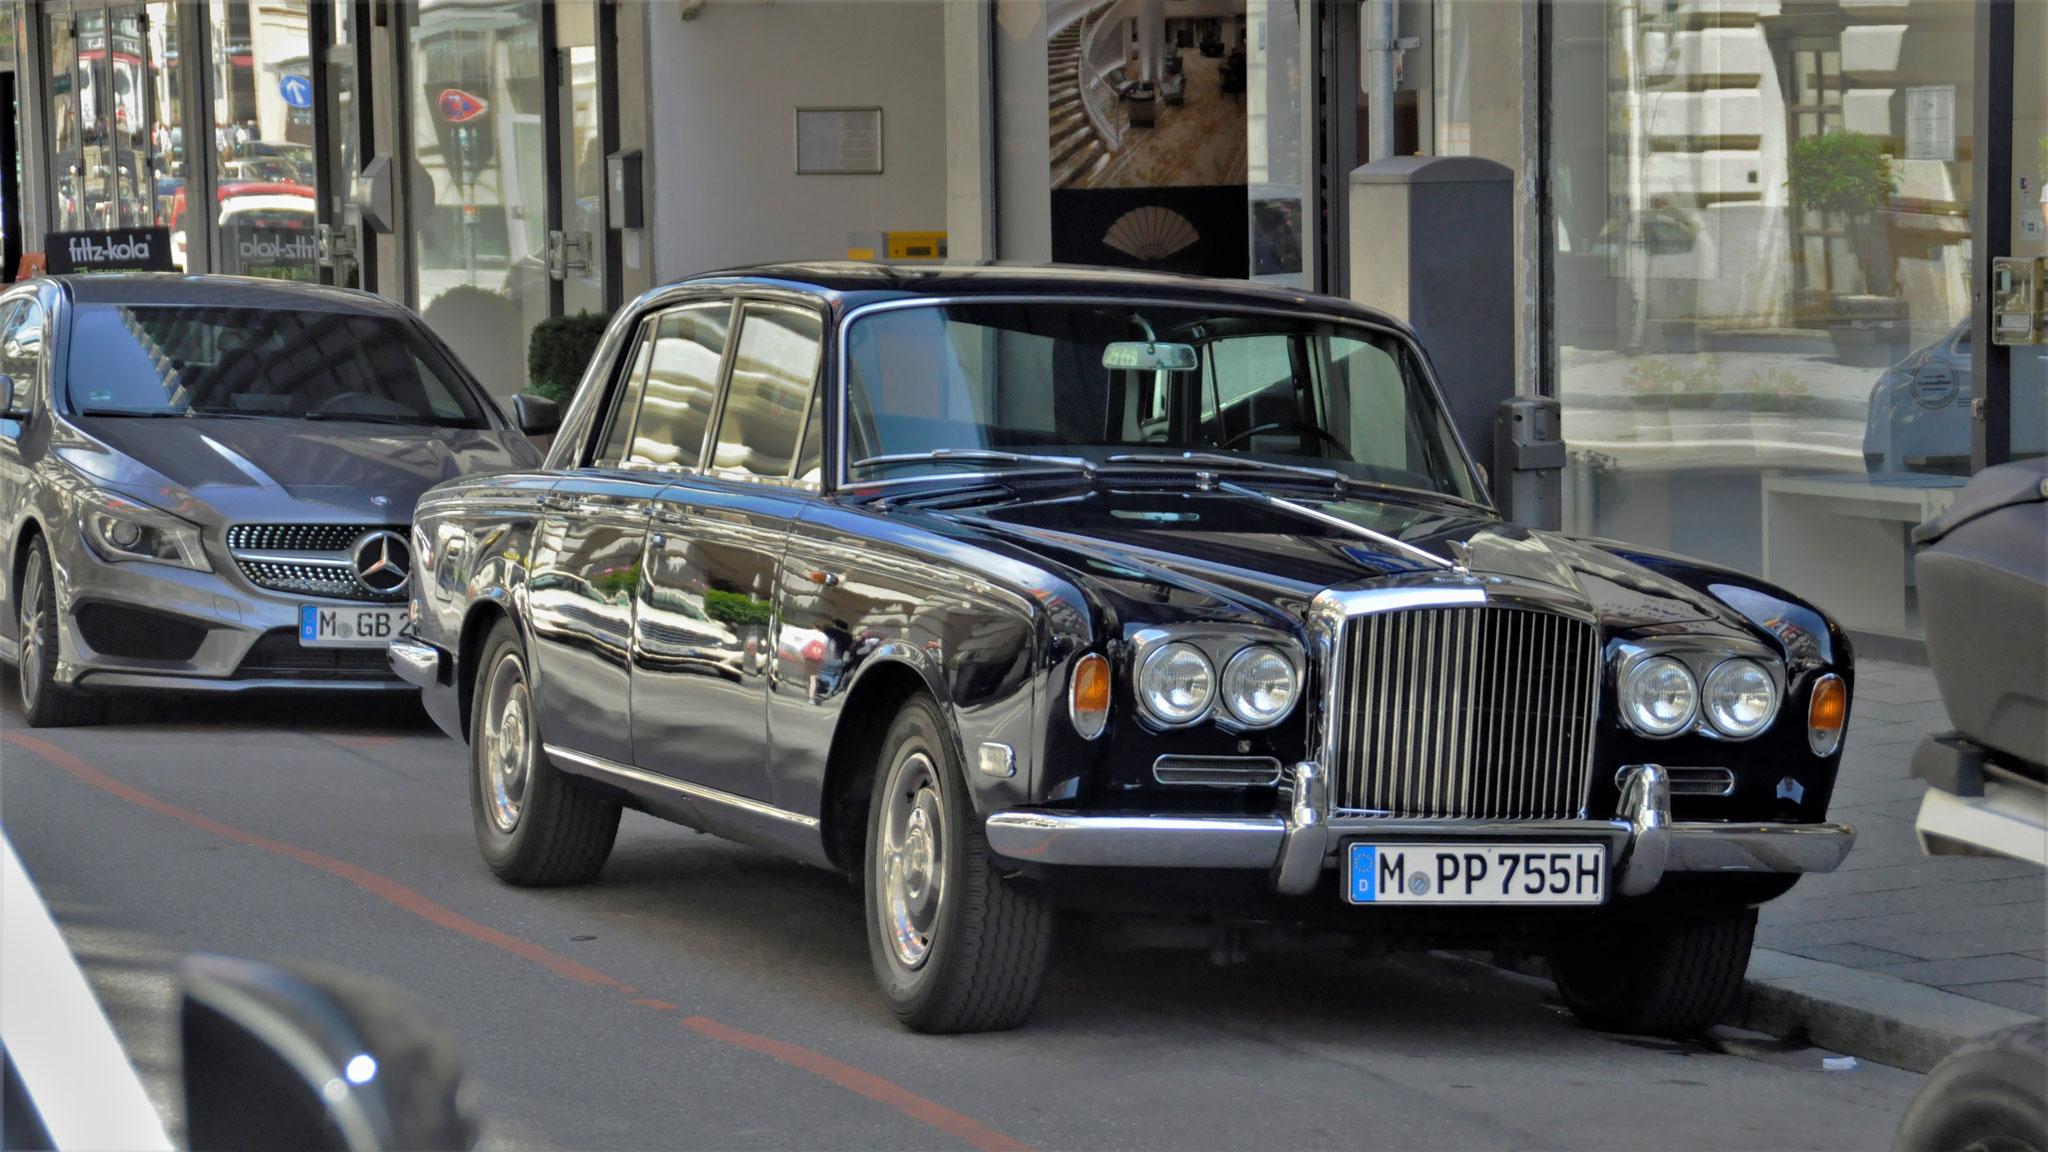 Rolls Royce Silver Shadow - M-PP-755H